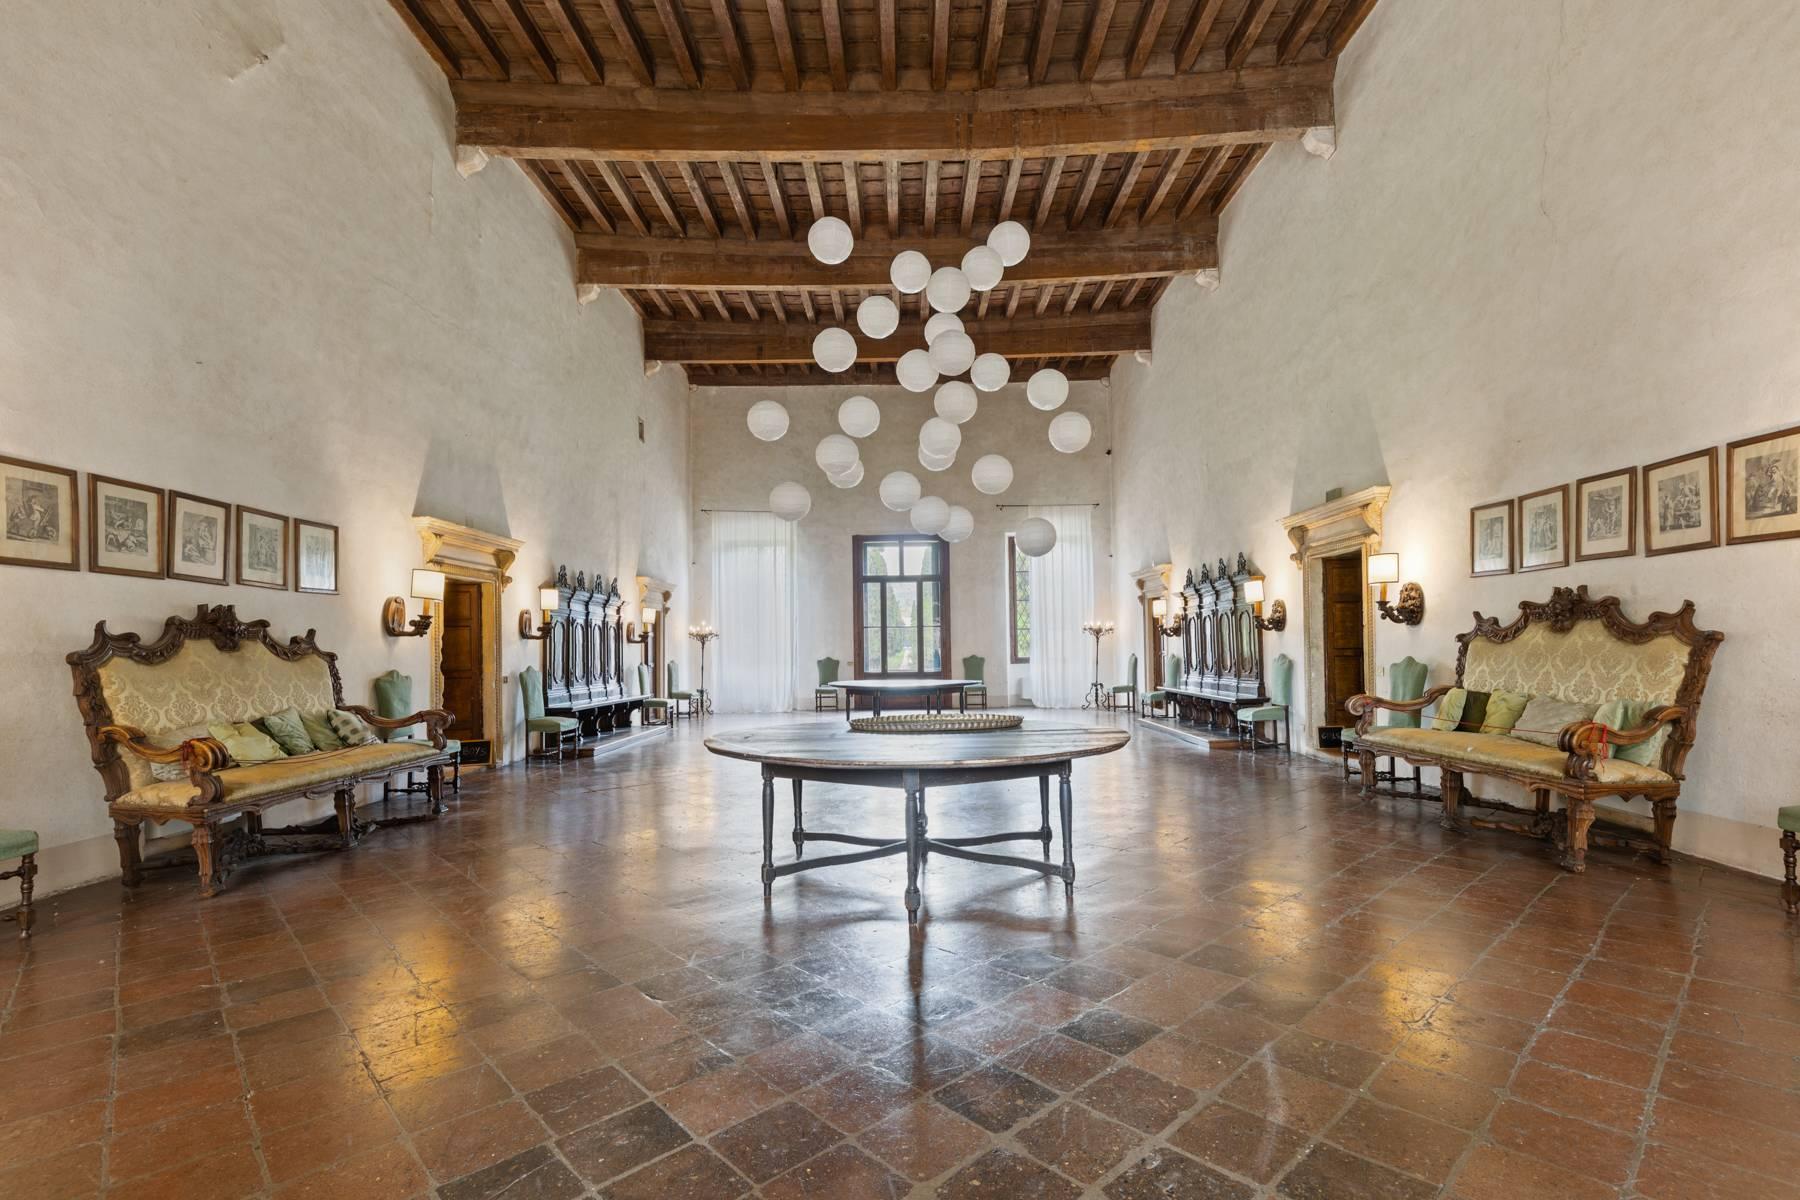 Villa in Vendita a Verona: 5 locali, 2400 mq - Foto 24